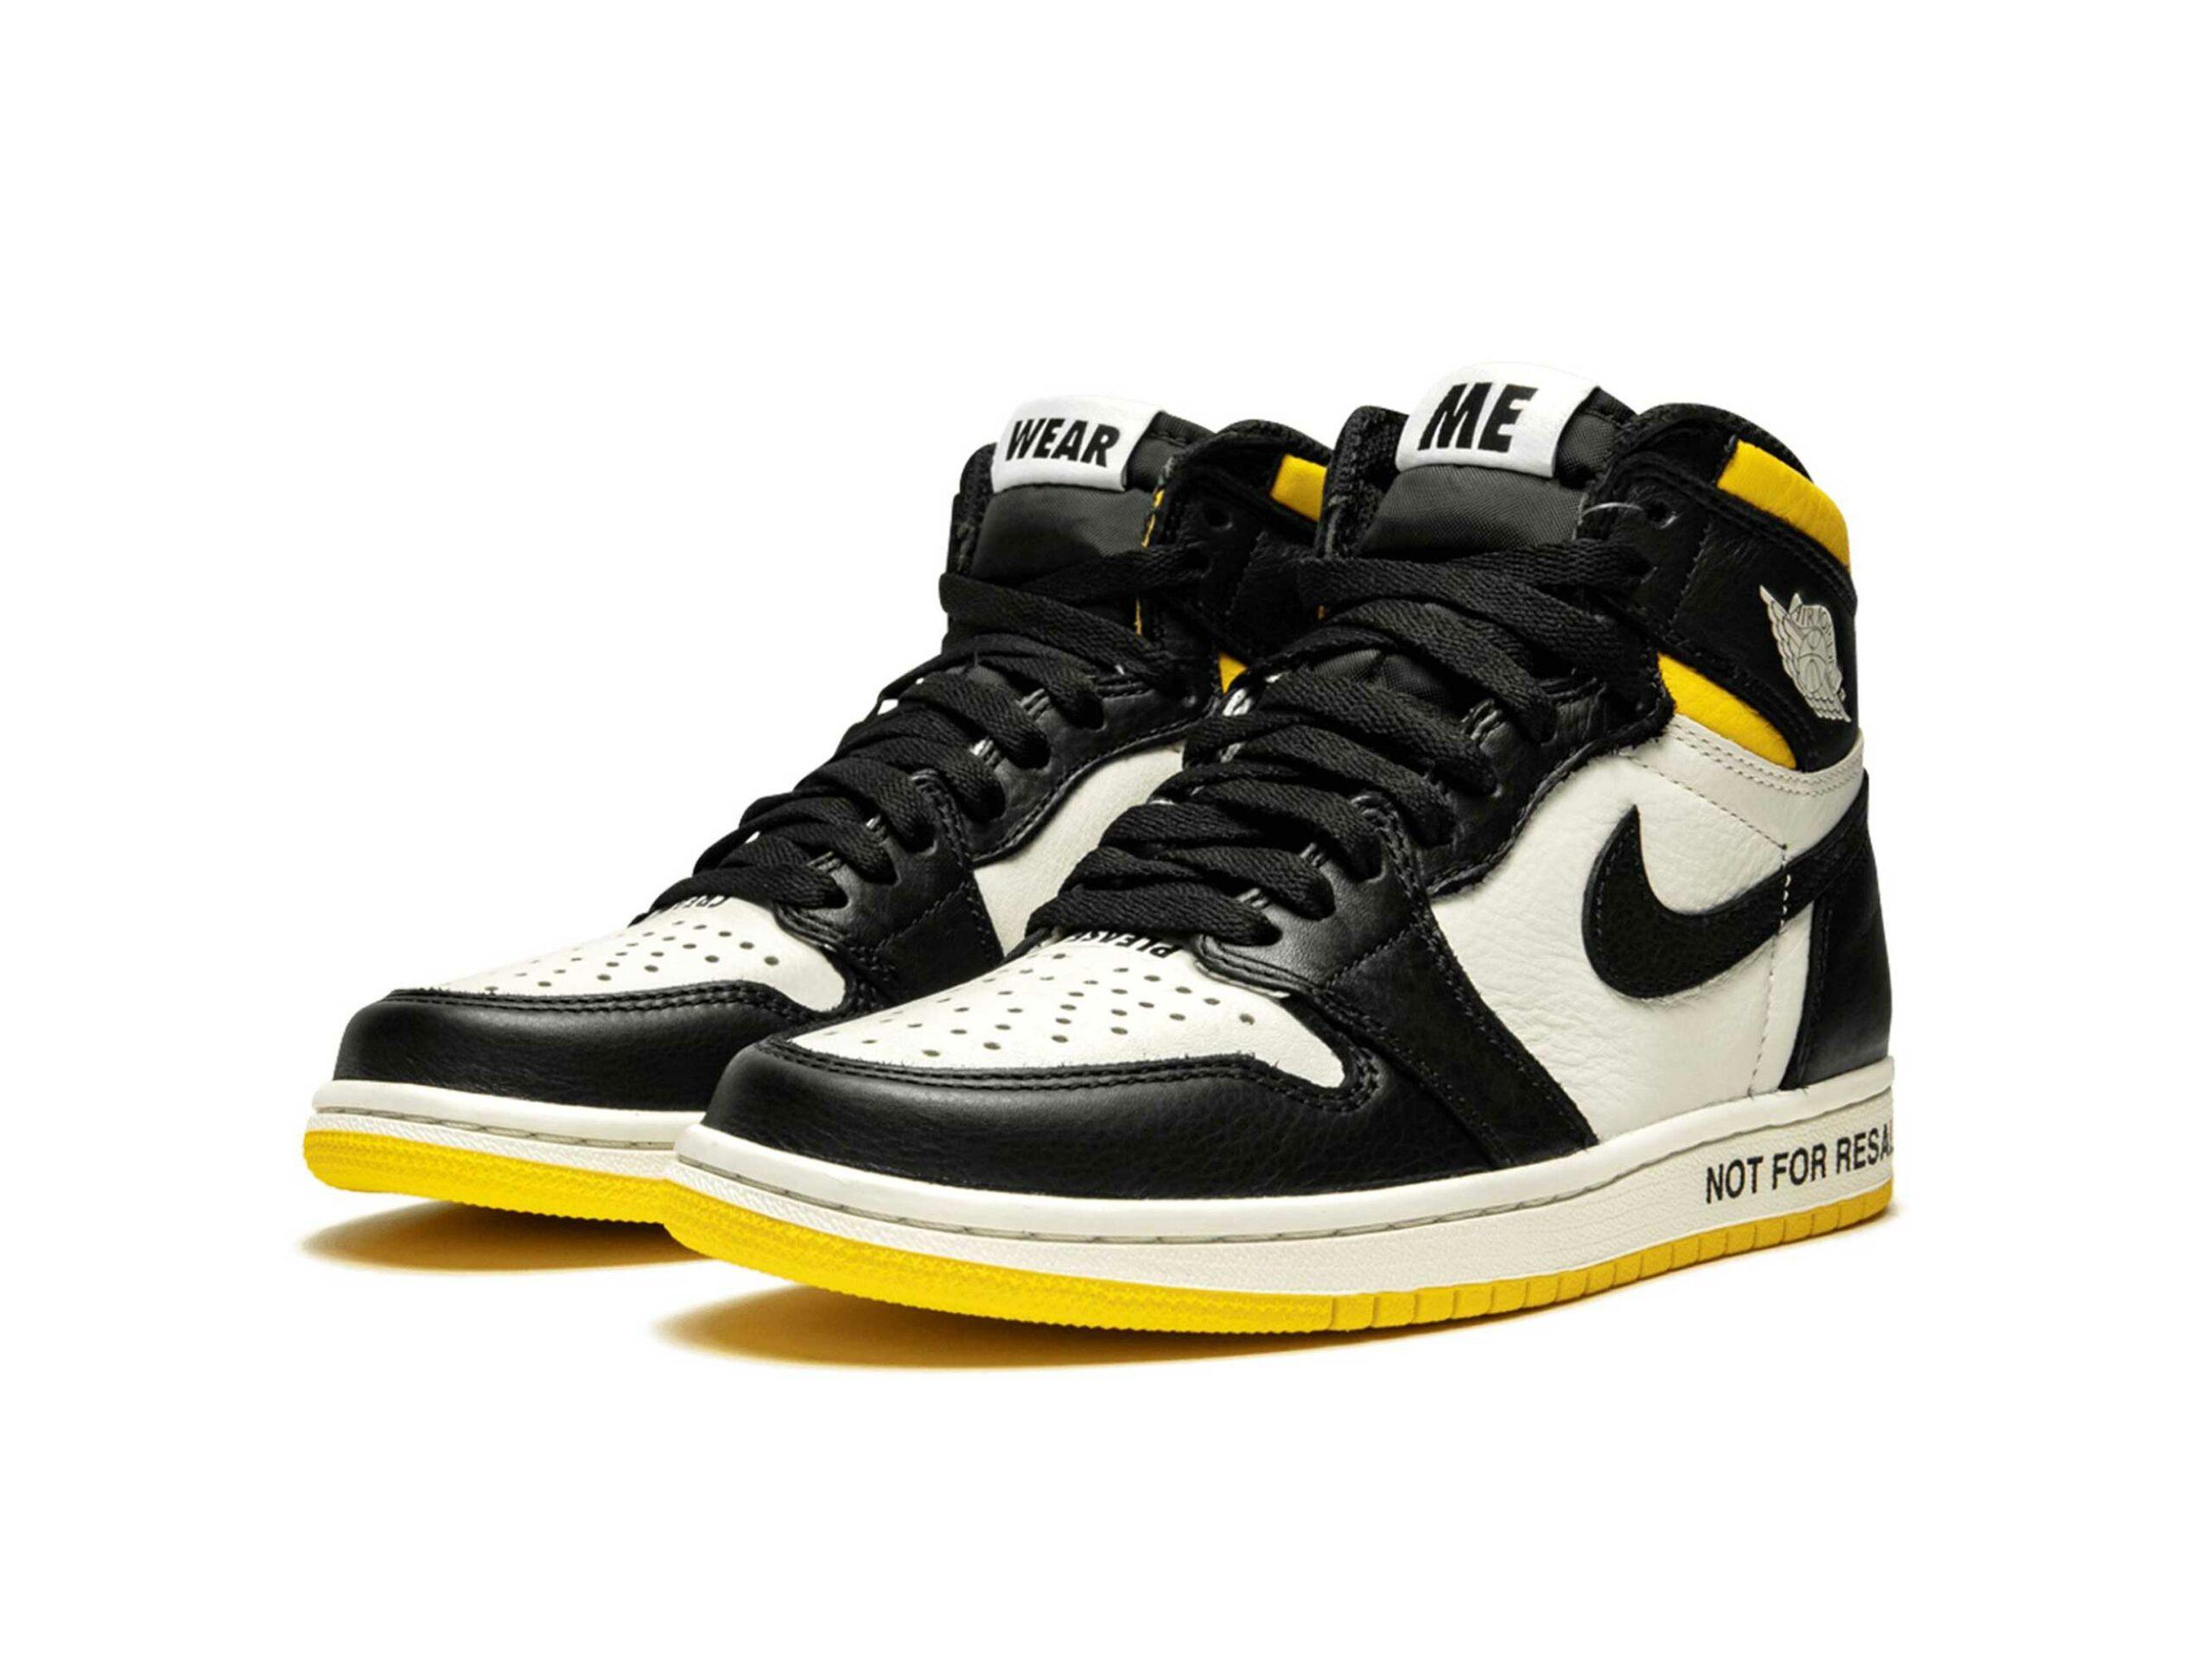 nike air Jordan 1 retro high not for resale 861428_107 купить